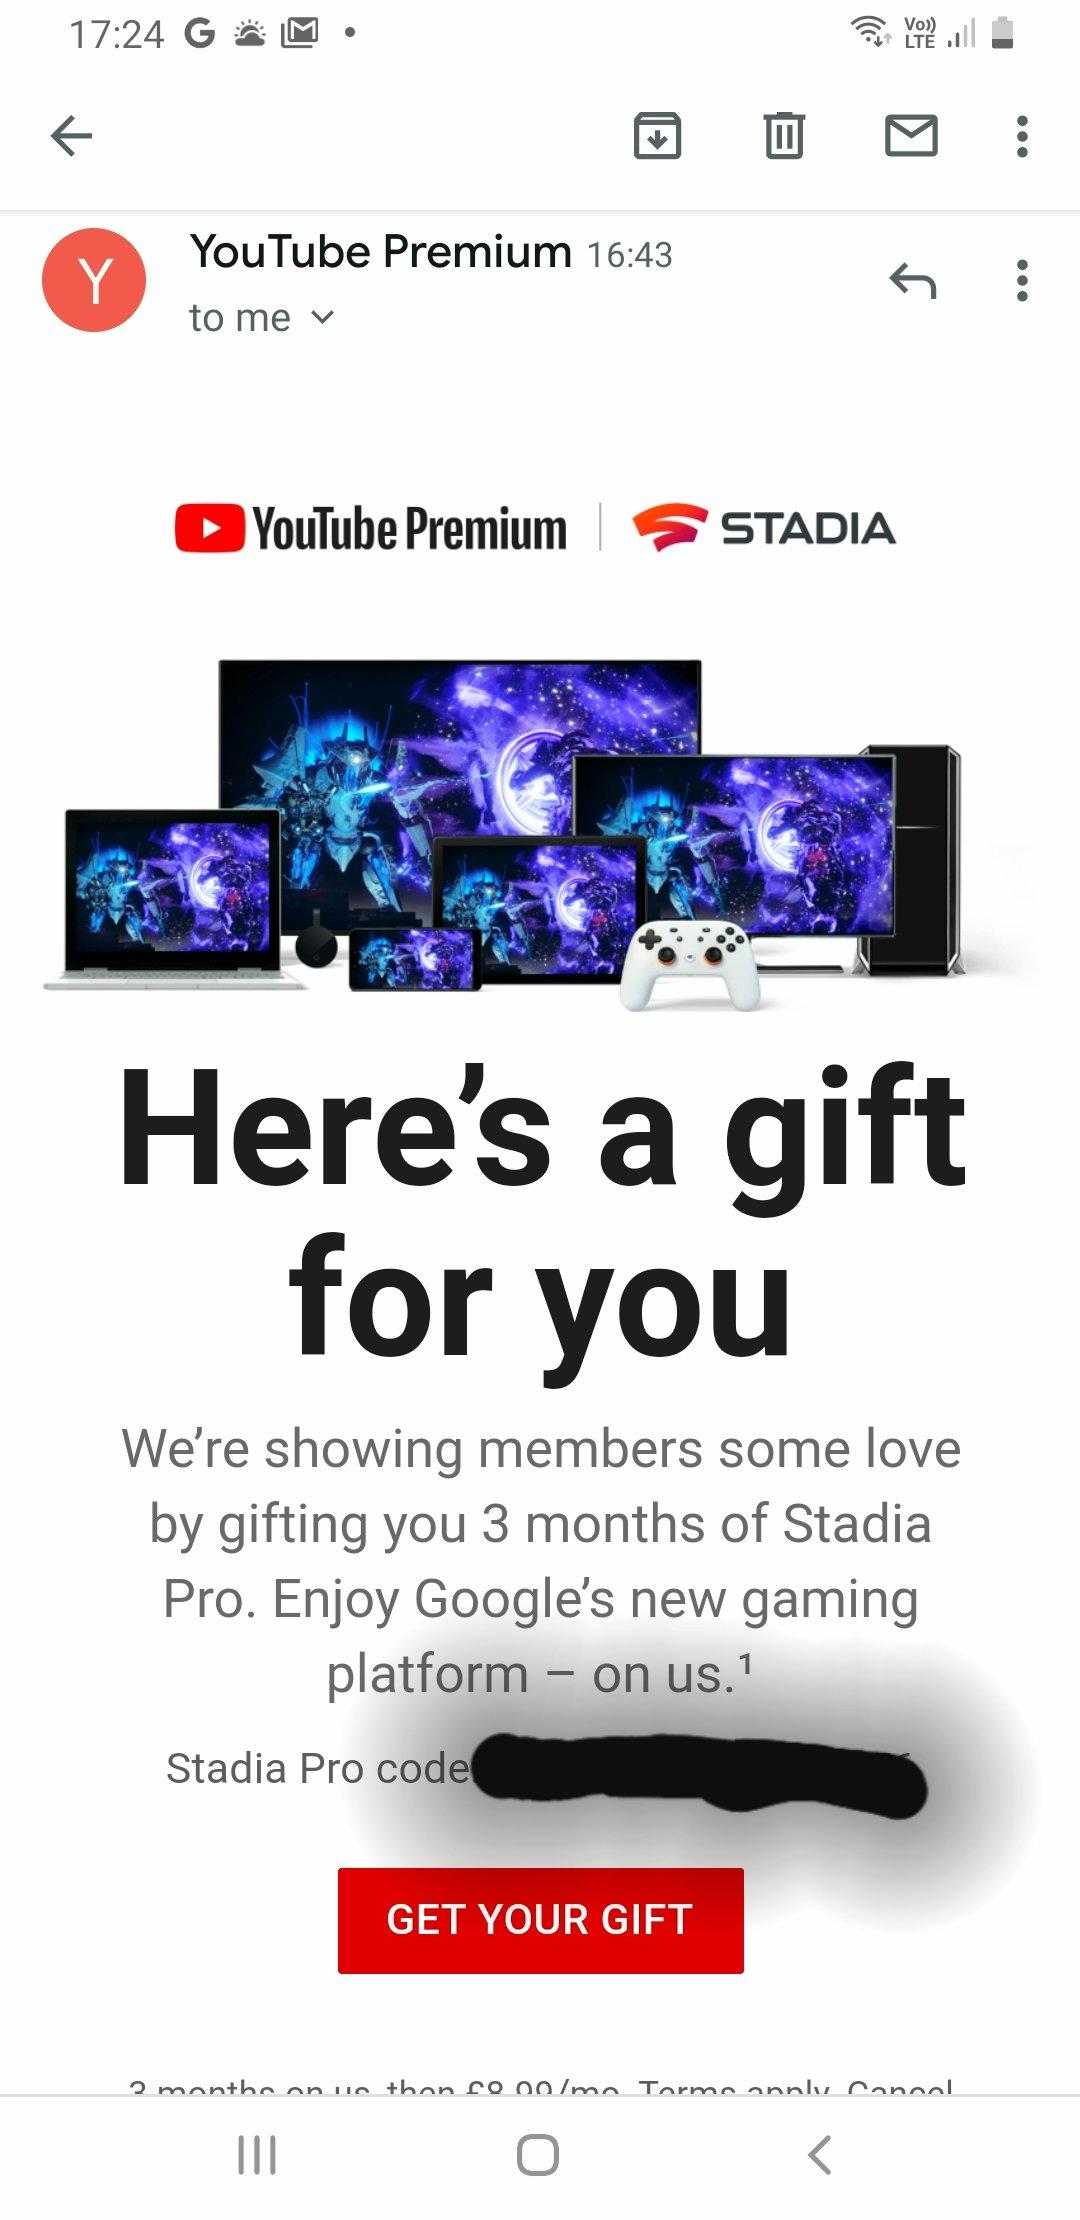 Google Stadia Pro YouTube Premium